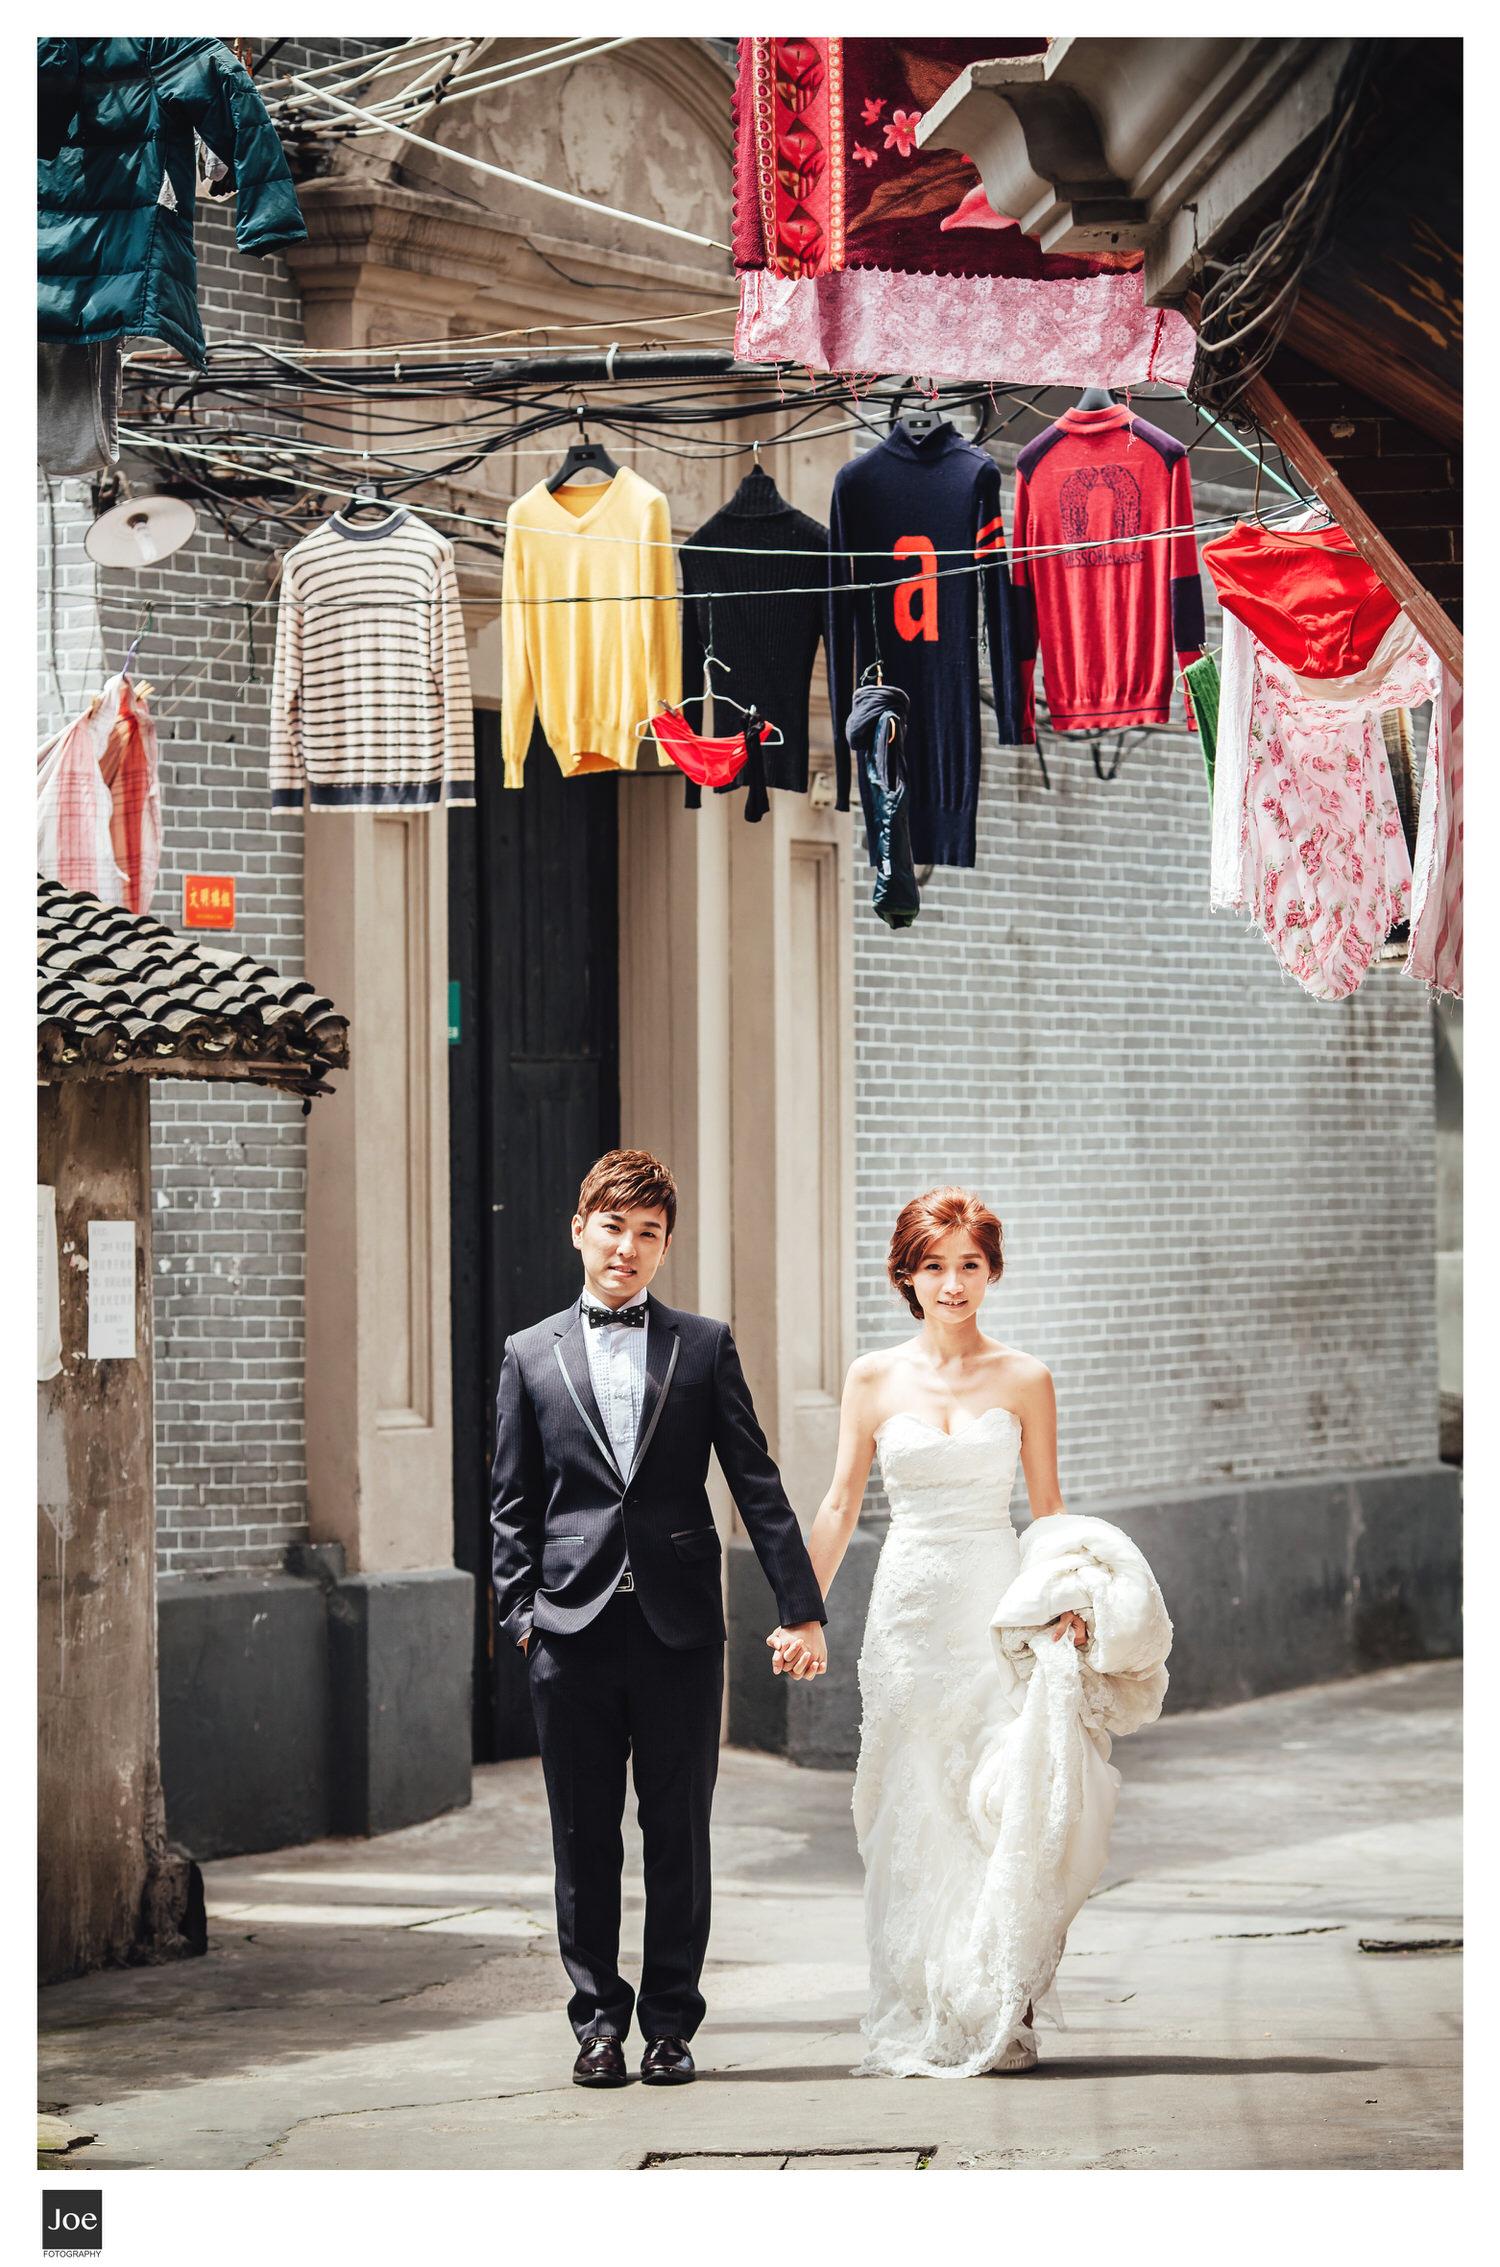 shanghai-pre-wedding-photography-05-ebby-calvin-joe-fotography.jpg